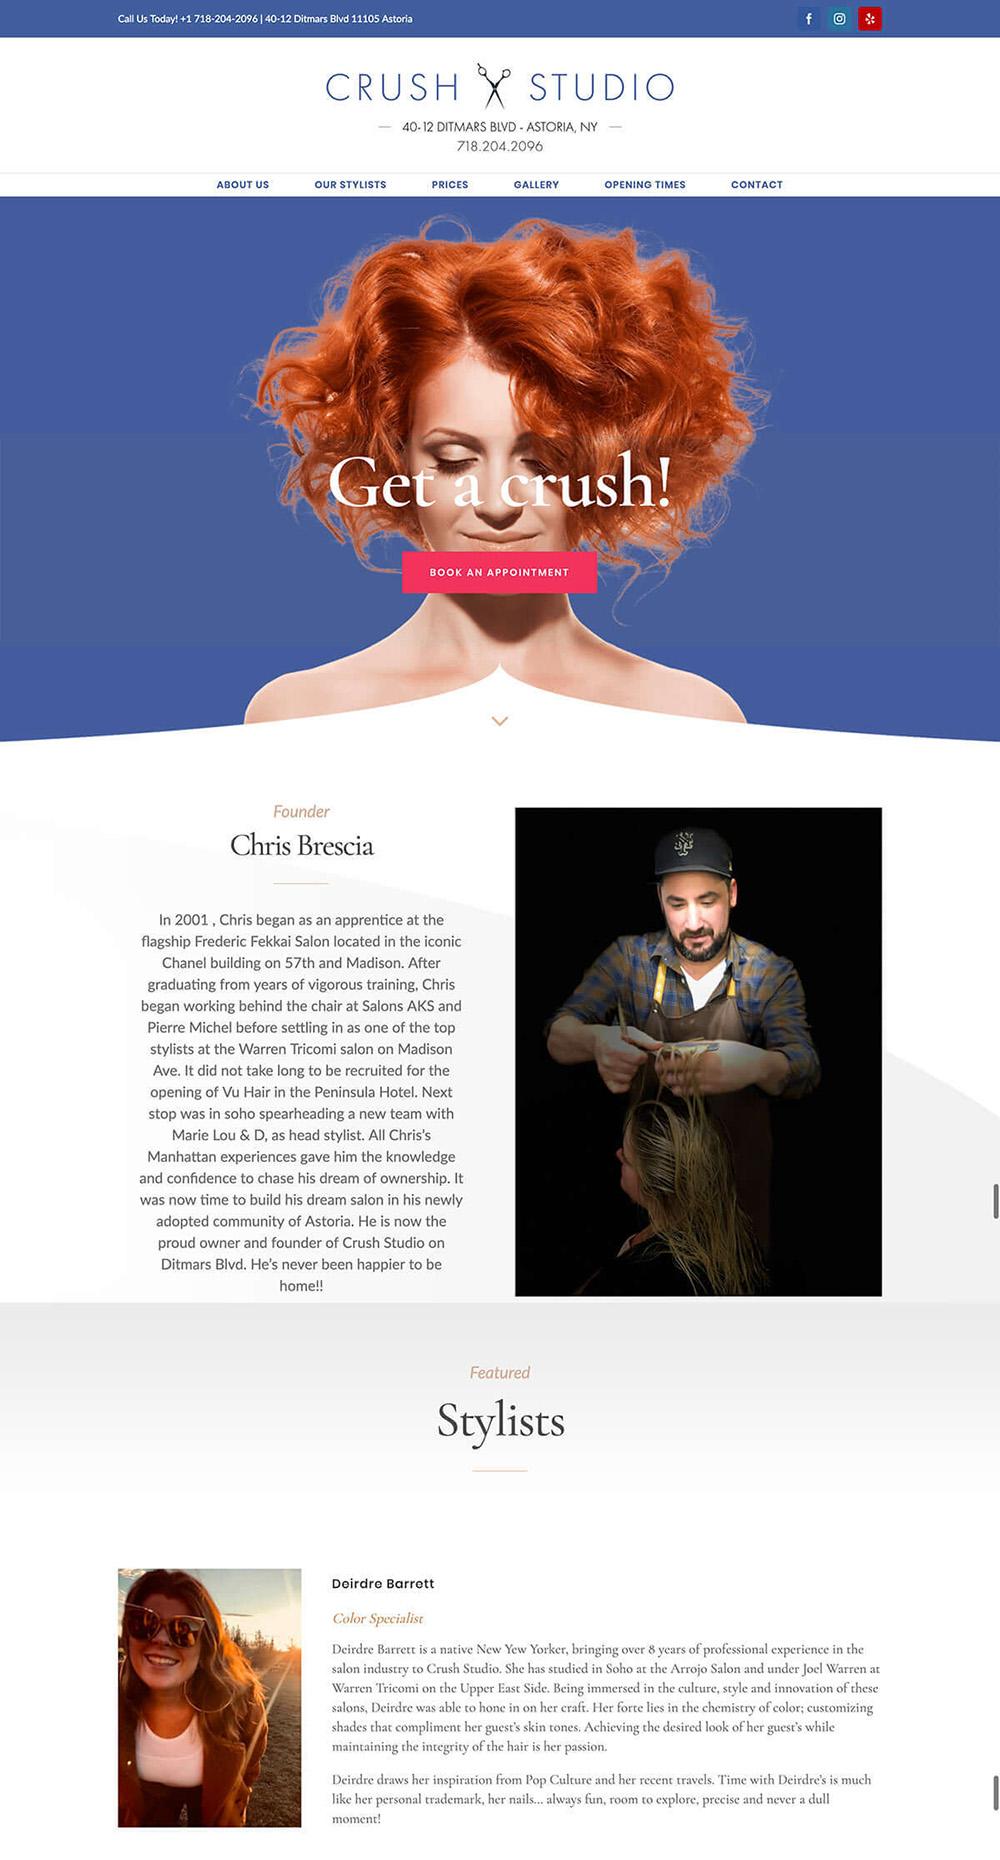 Crush Studio Project - Digital Marketing